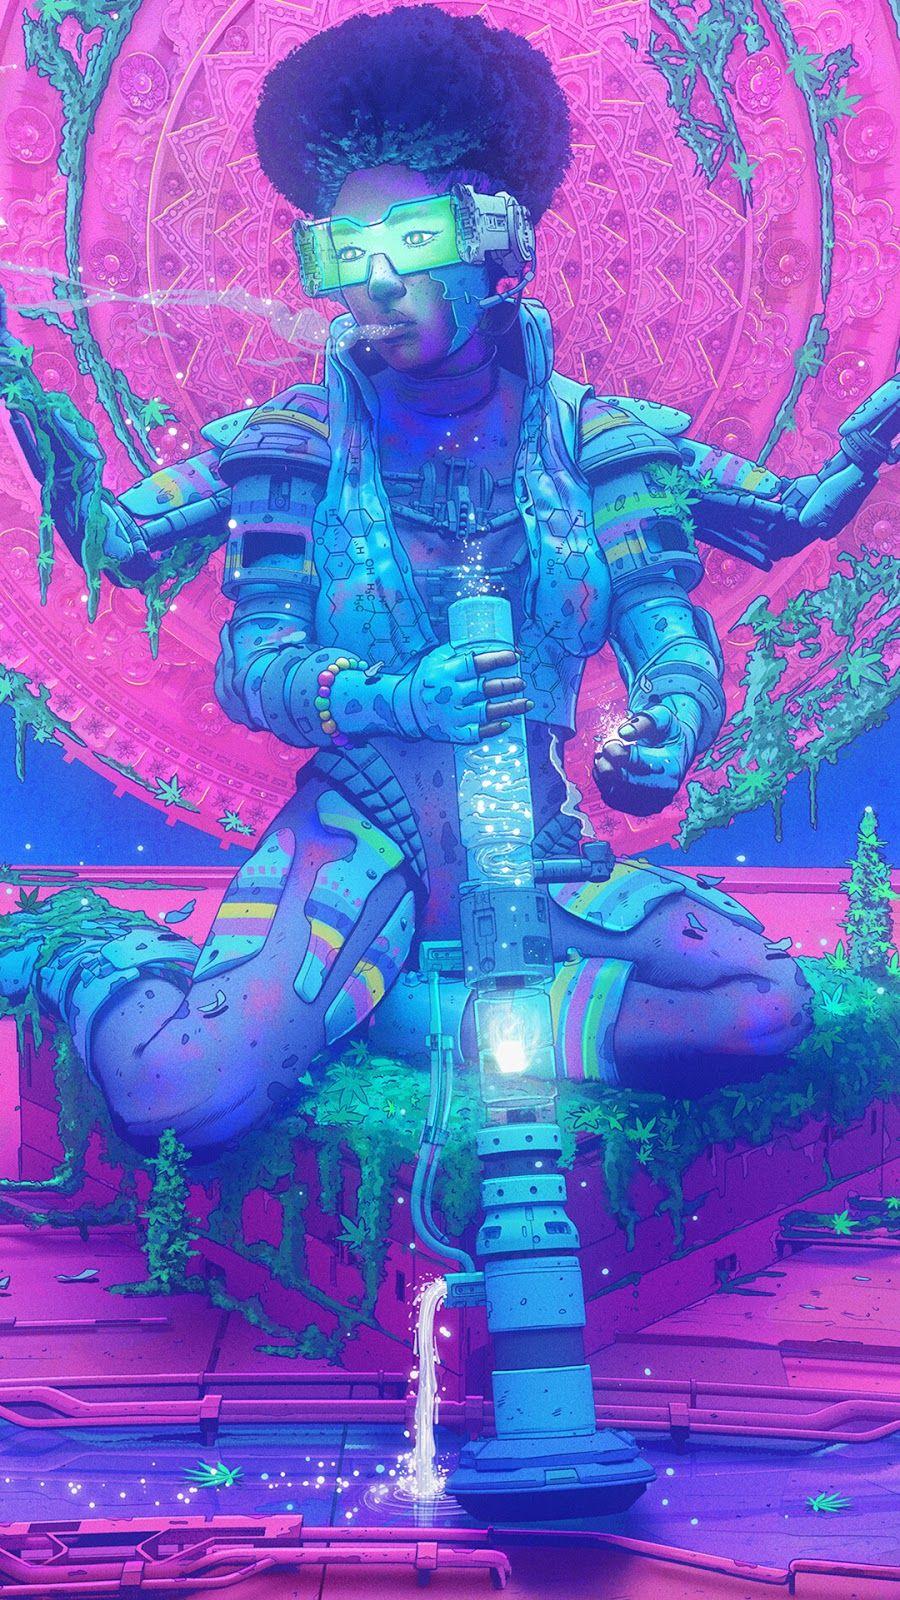 Cyberpunk phone wallpapers | HeroScreen in 2020 | Phone ...